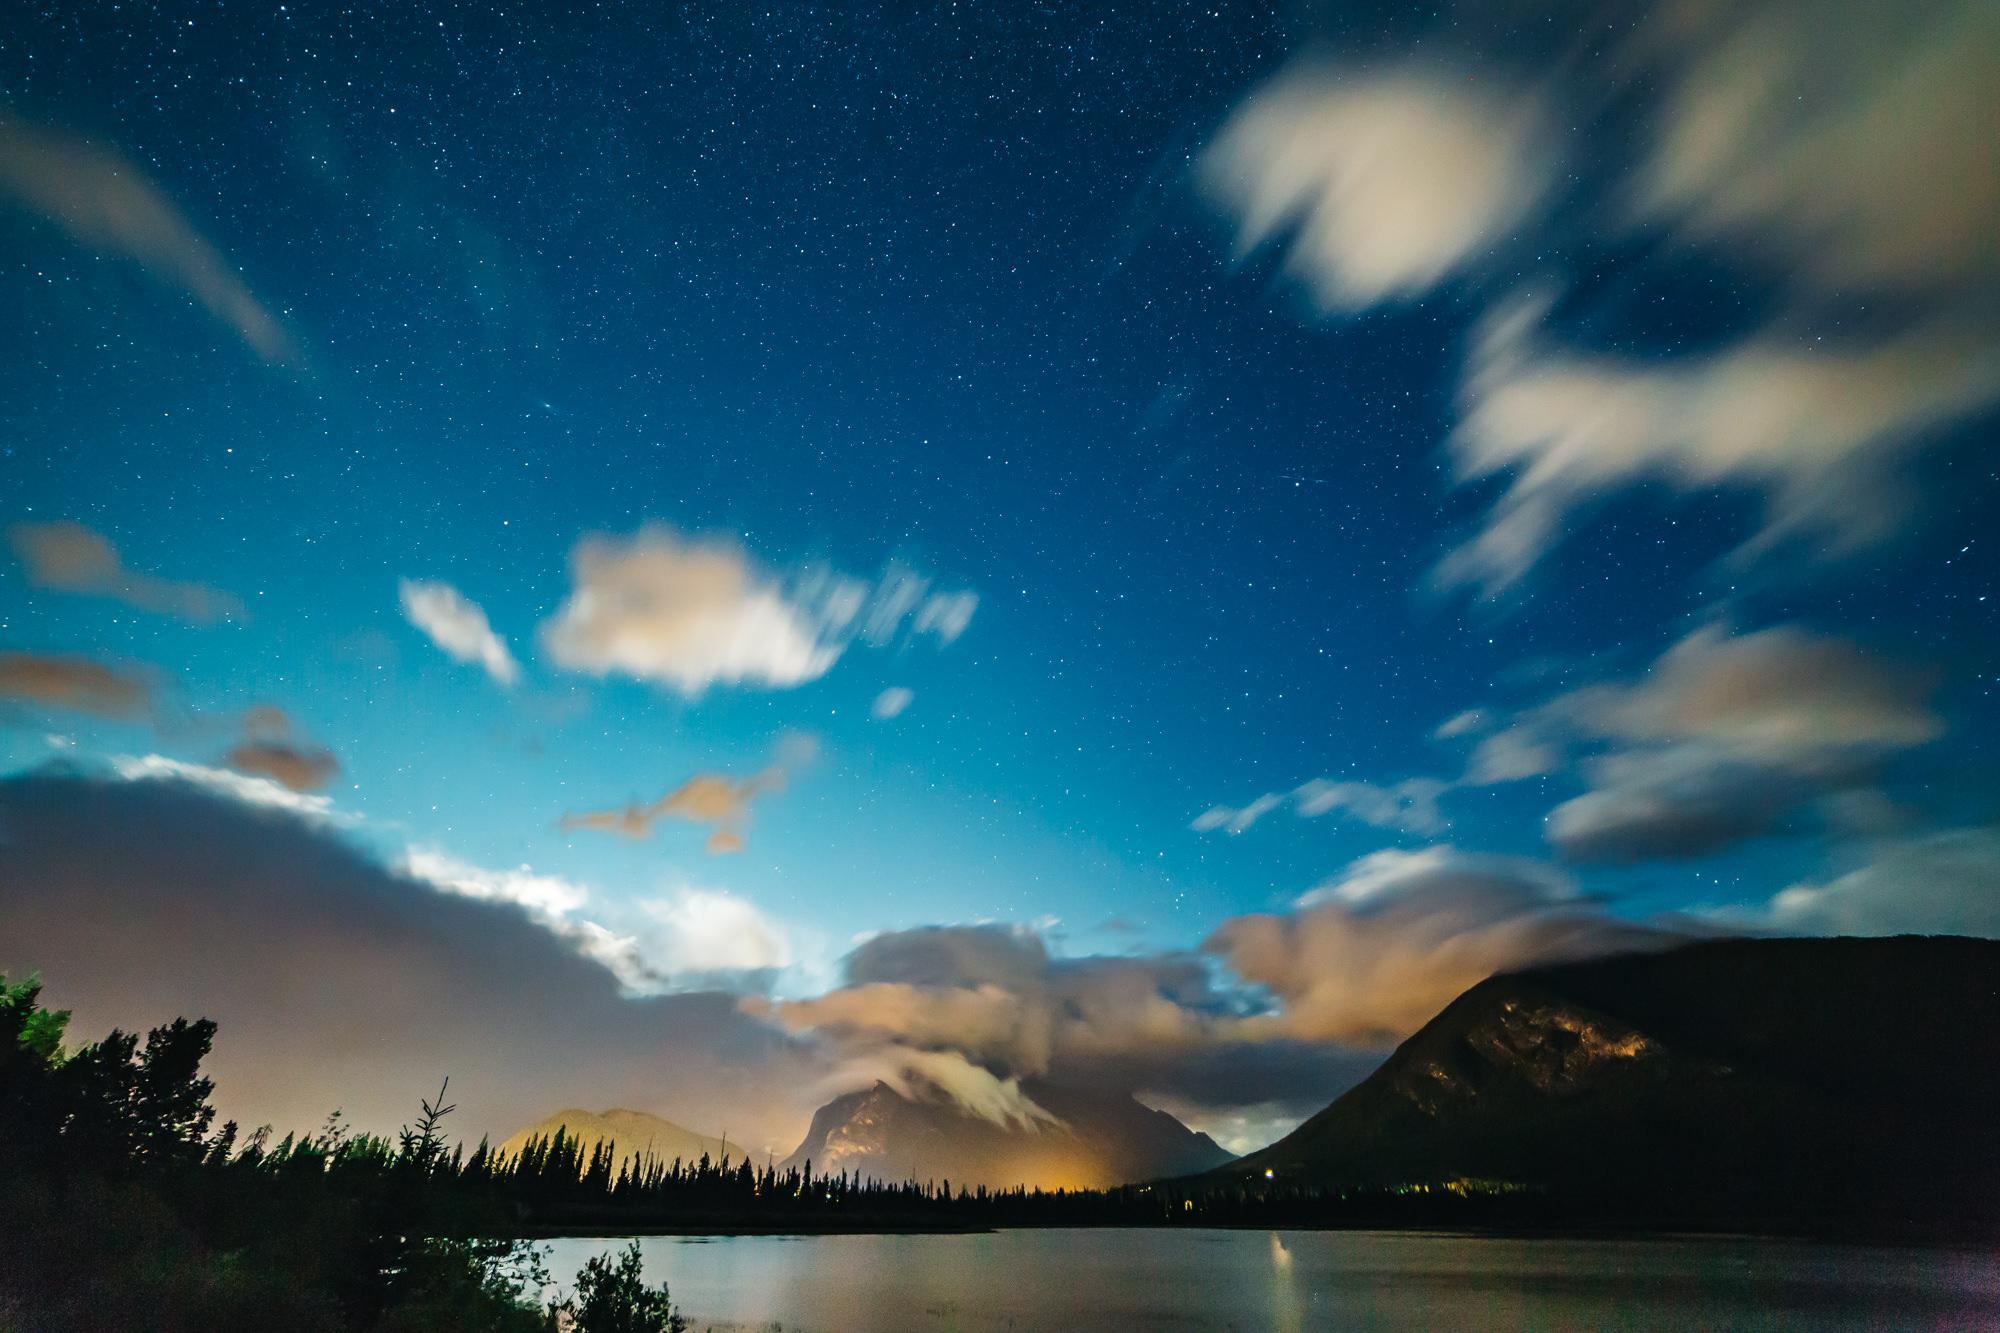 Night Photography at Vermilion Lake